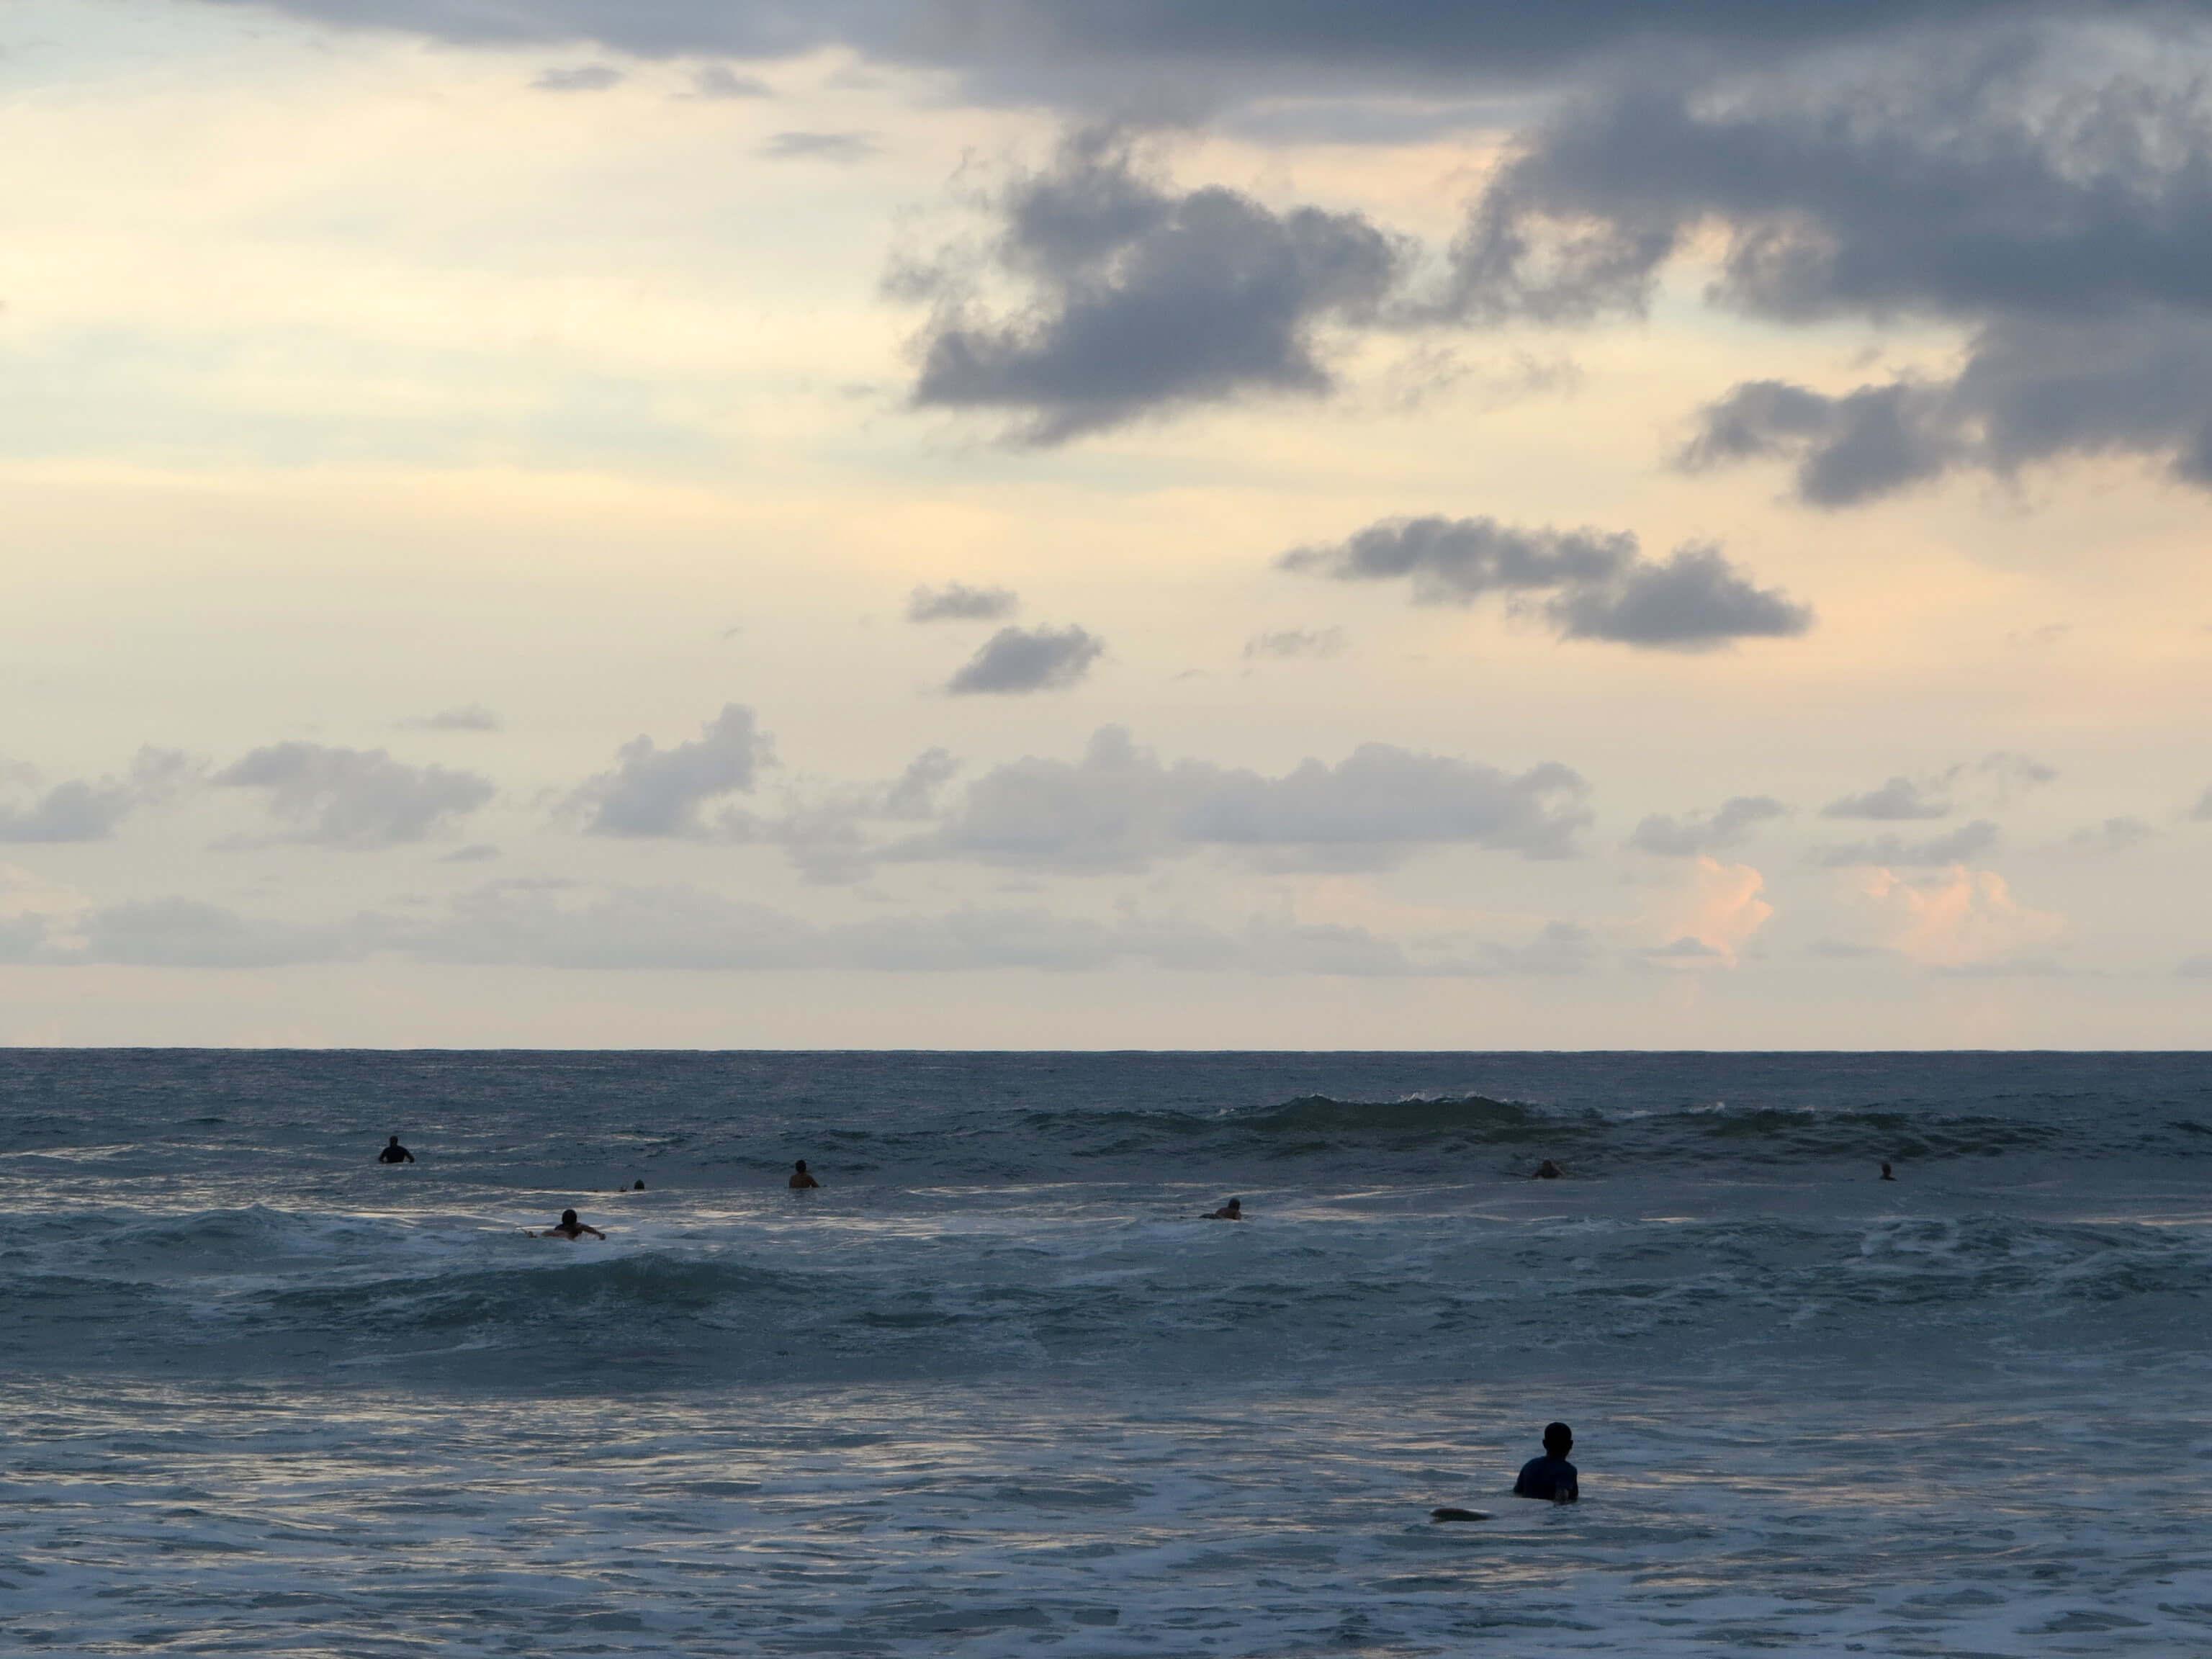 Surferansturm am Abend